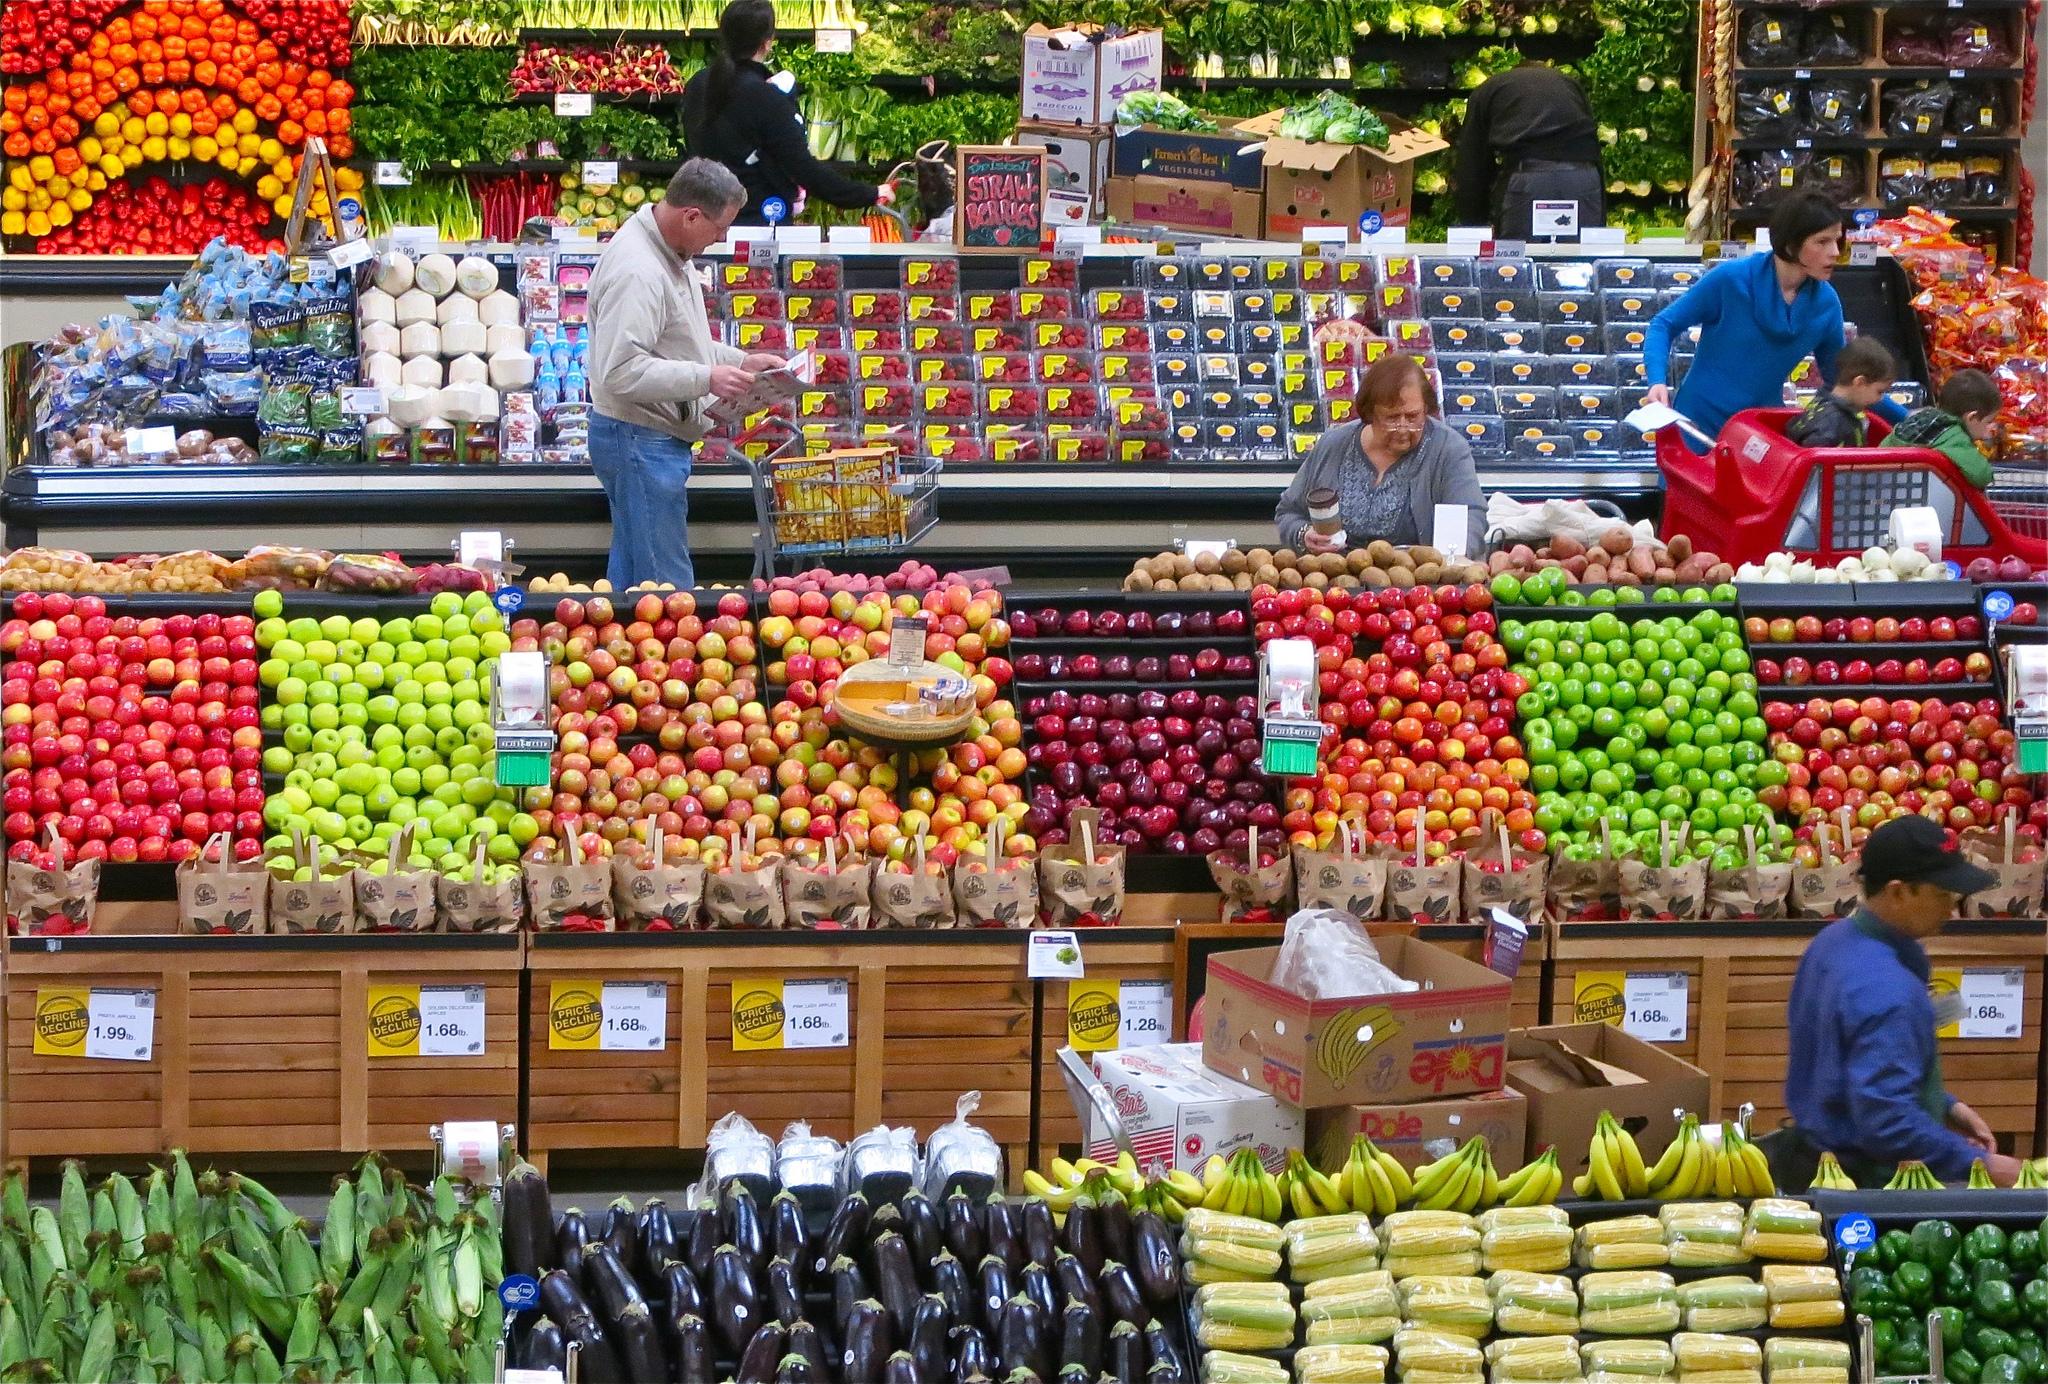 Aldi Food Market Hours